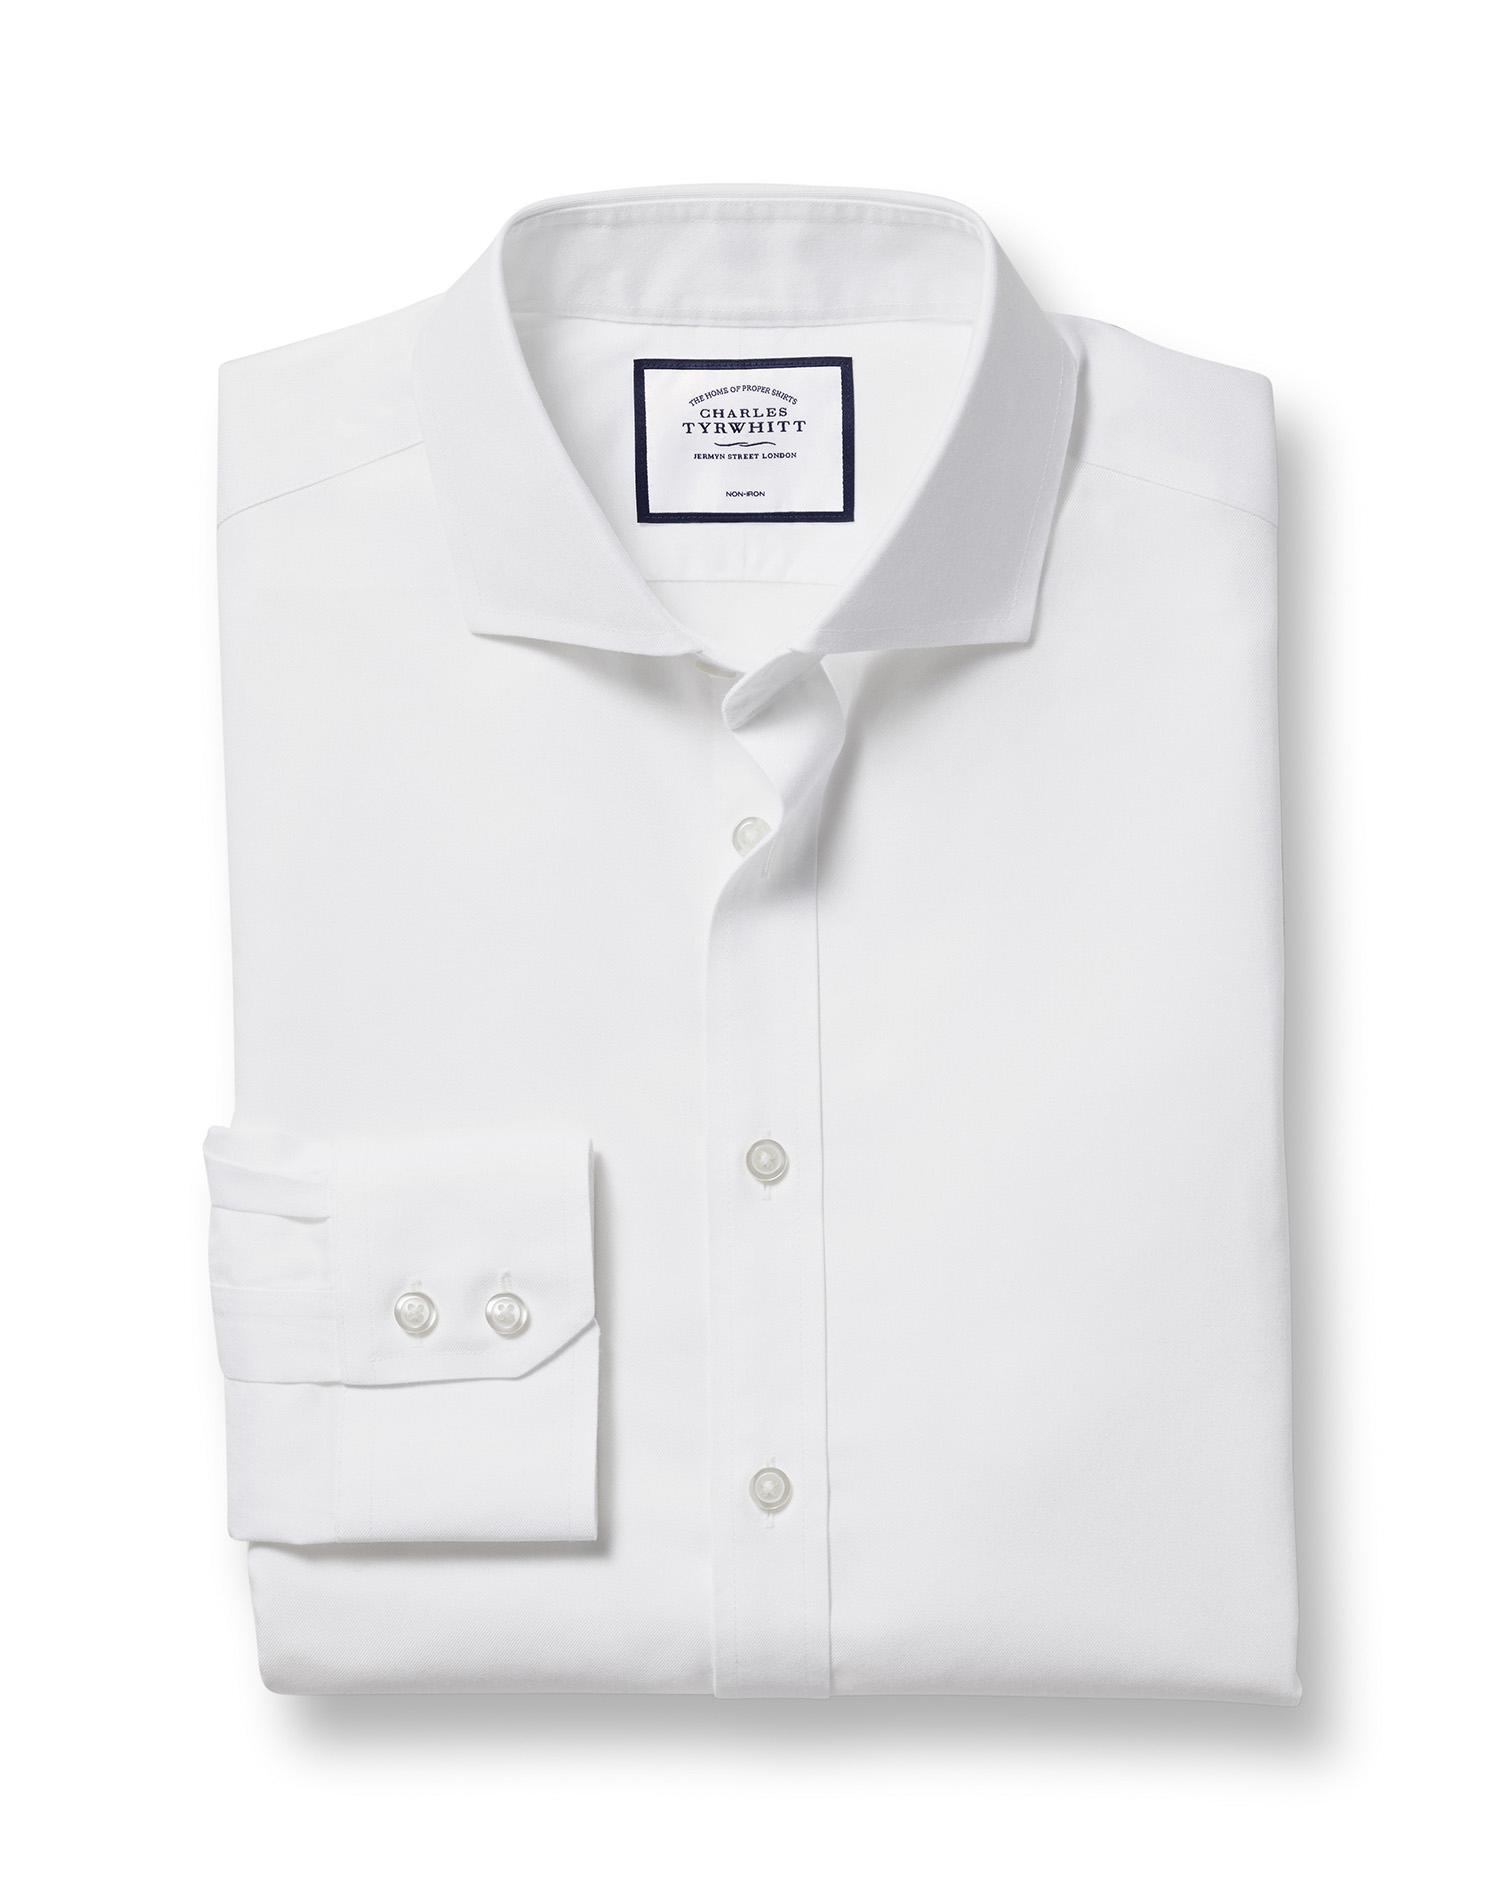 Cotton Extra Slim Fit White Non-Iron Twill Extreme Cutaway Shirt